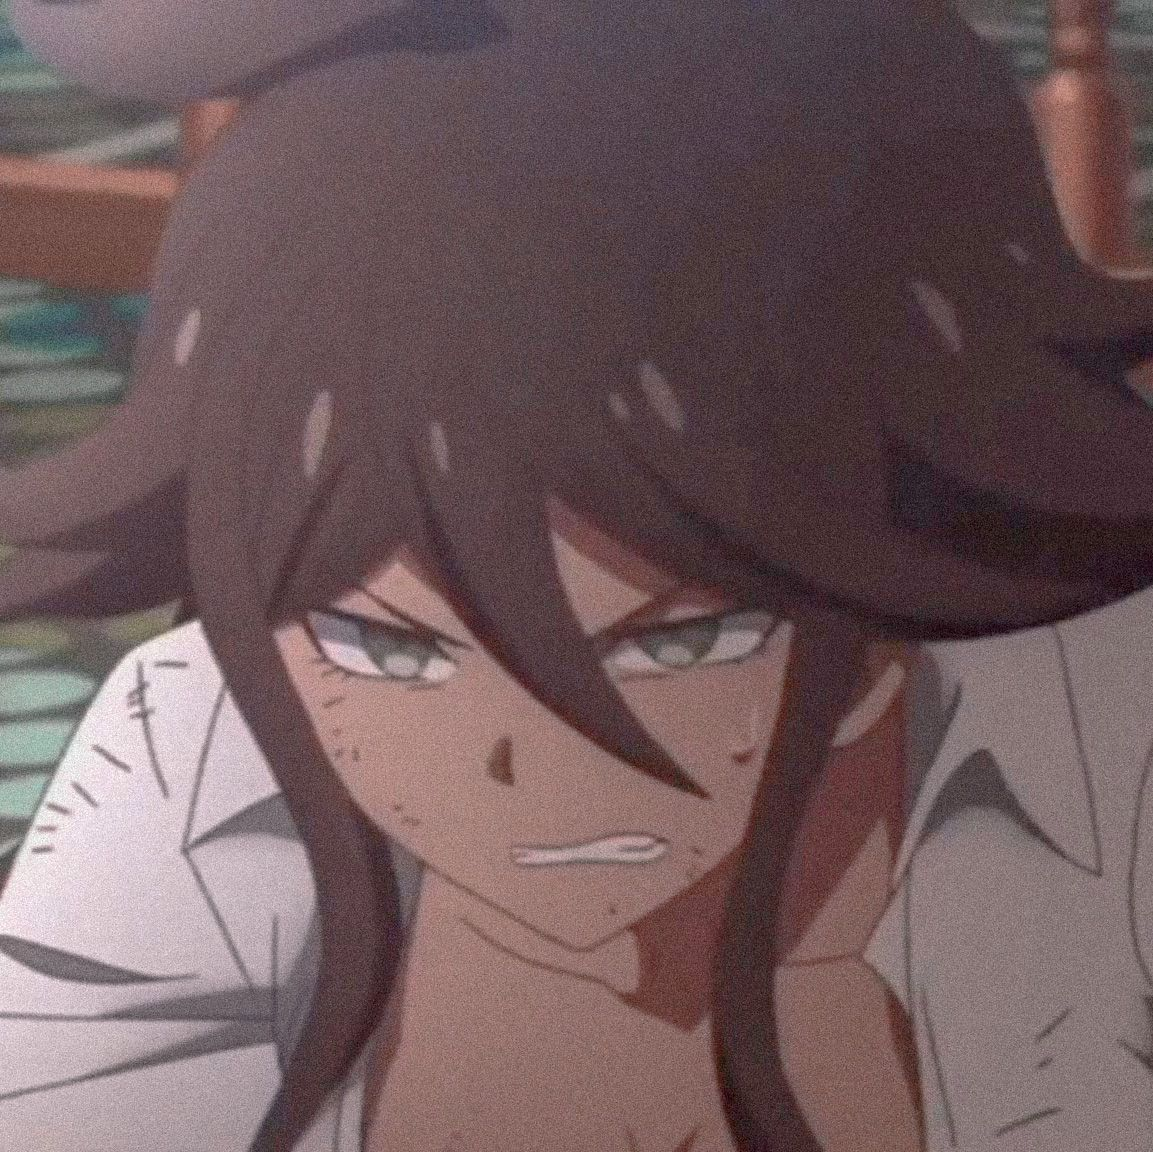 Akane Owari   Danganronpa, Anime icons, Naruto shippuden anime